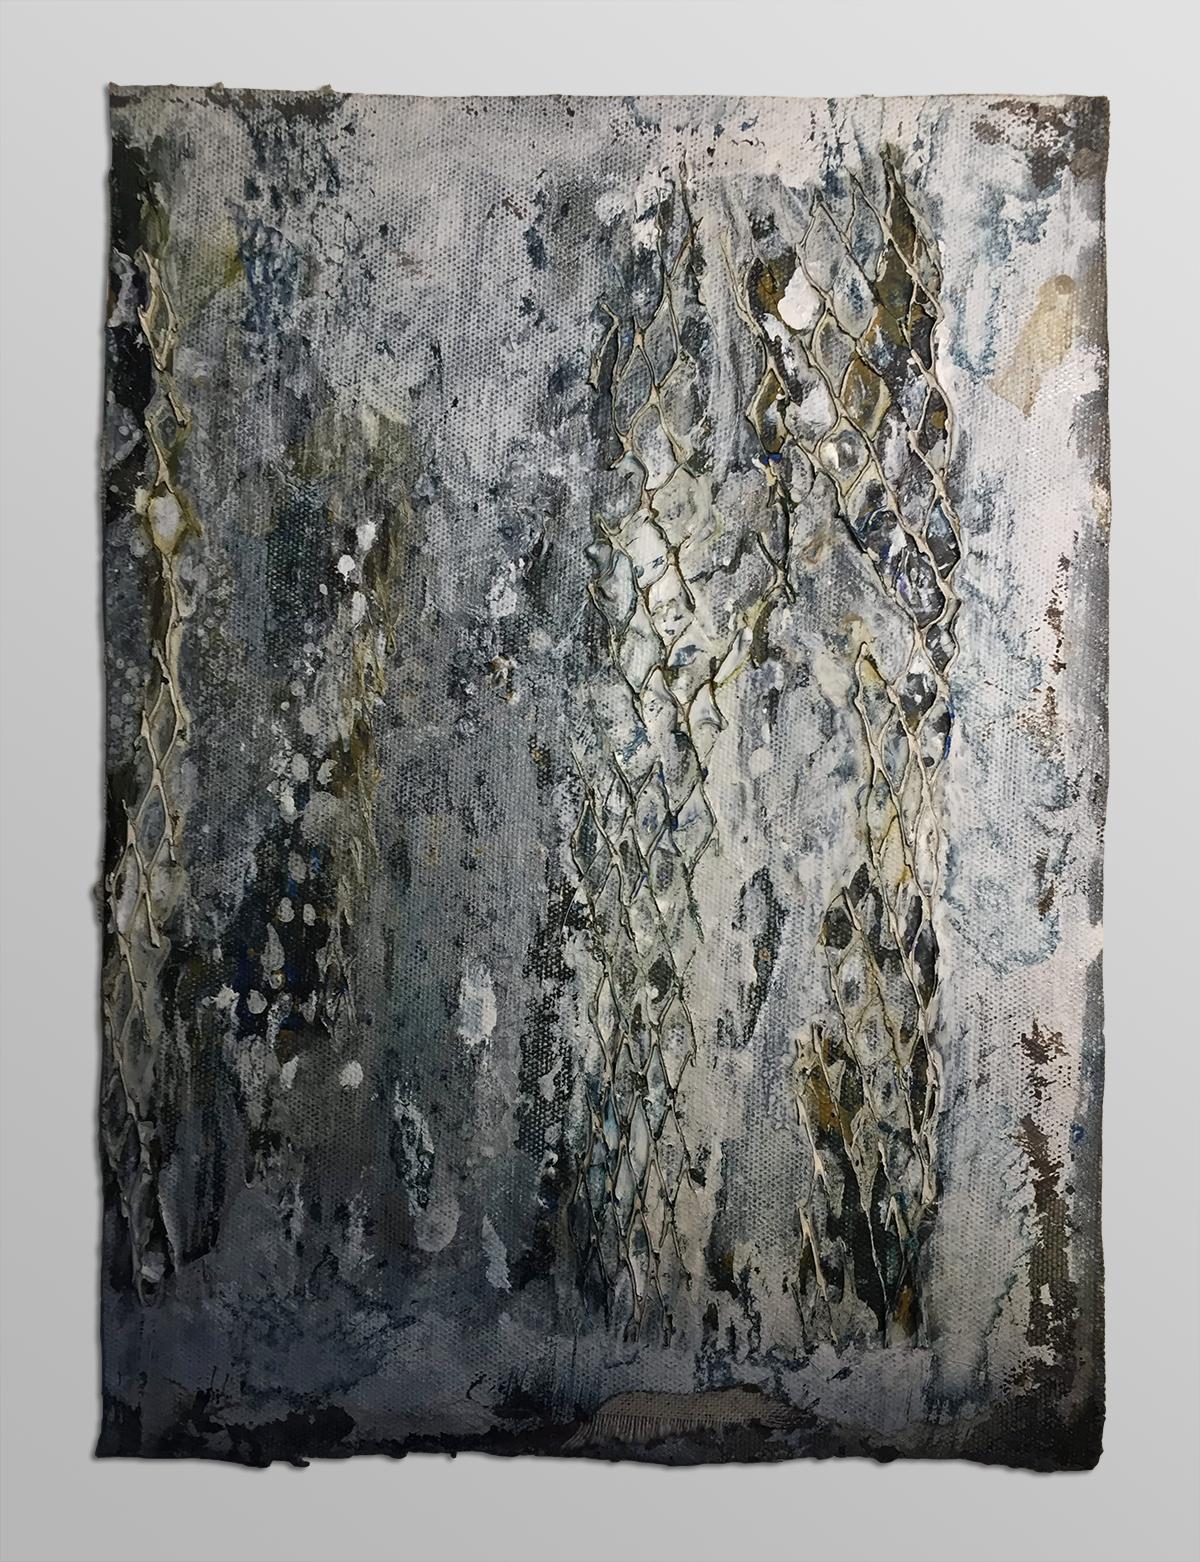 SUDDEN SNOW   Acrylic, net, canvas  11 x 8 Inches